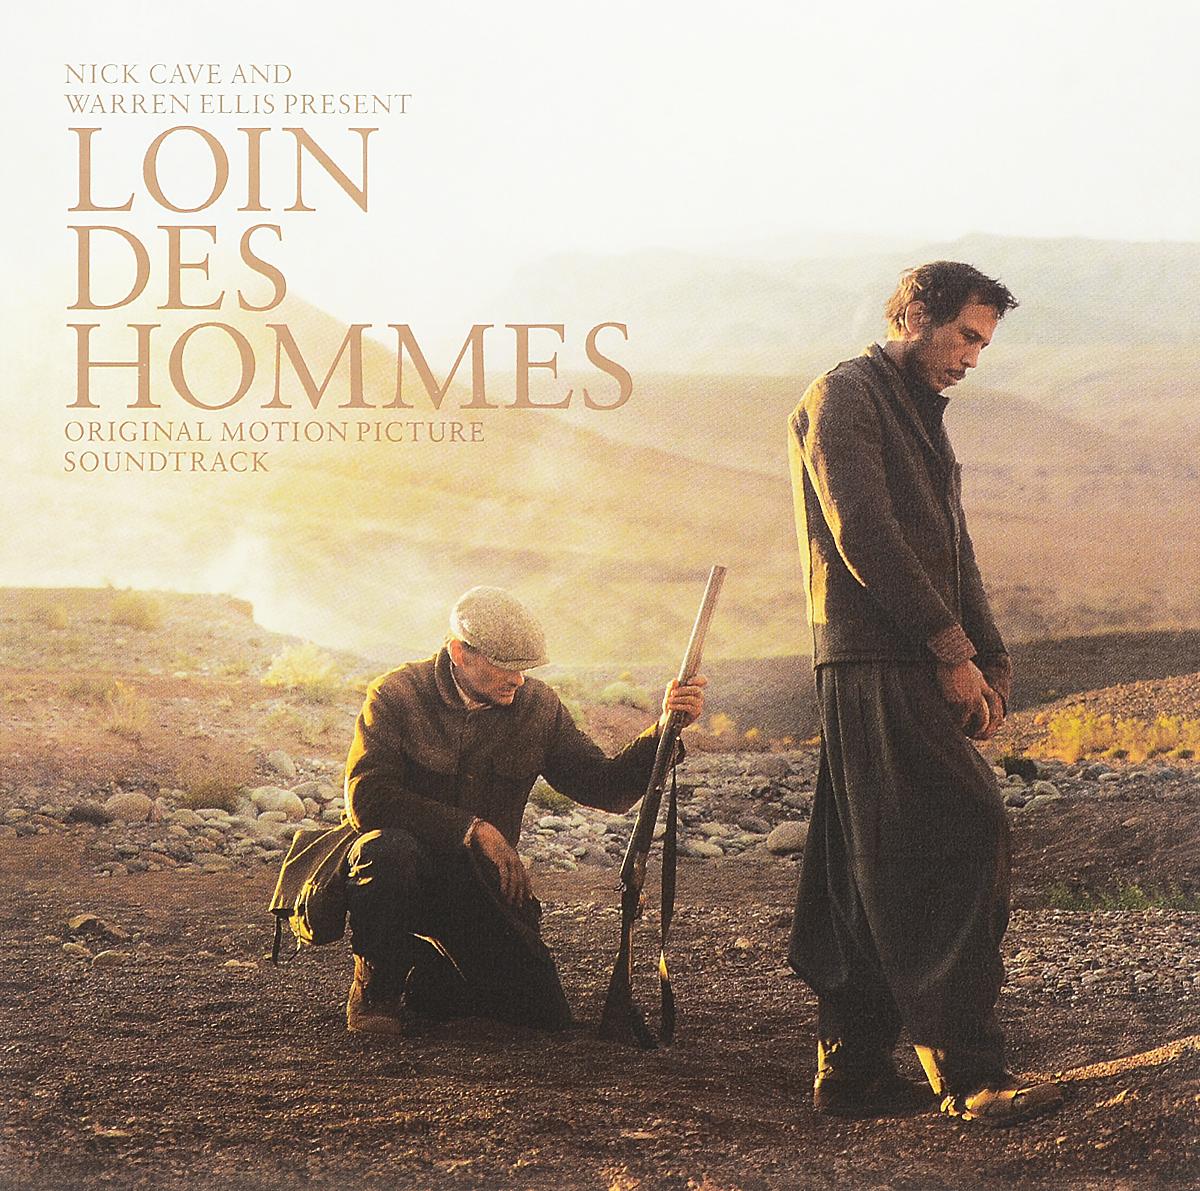 Ник Кейв,Уоррен Эллис Nick Cave and Warren Ellis. Loin Des Hommes. Original Motion Picture Soundtrack виниловая пластинка nick cave ellis warren kings ost